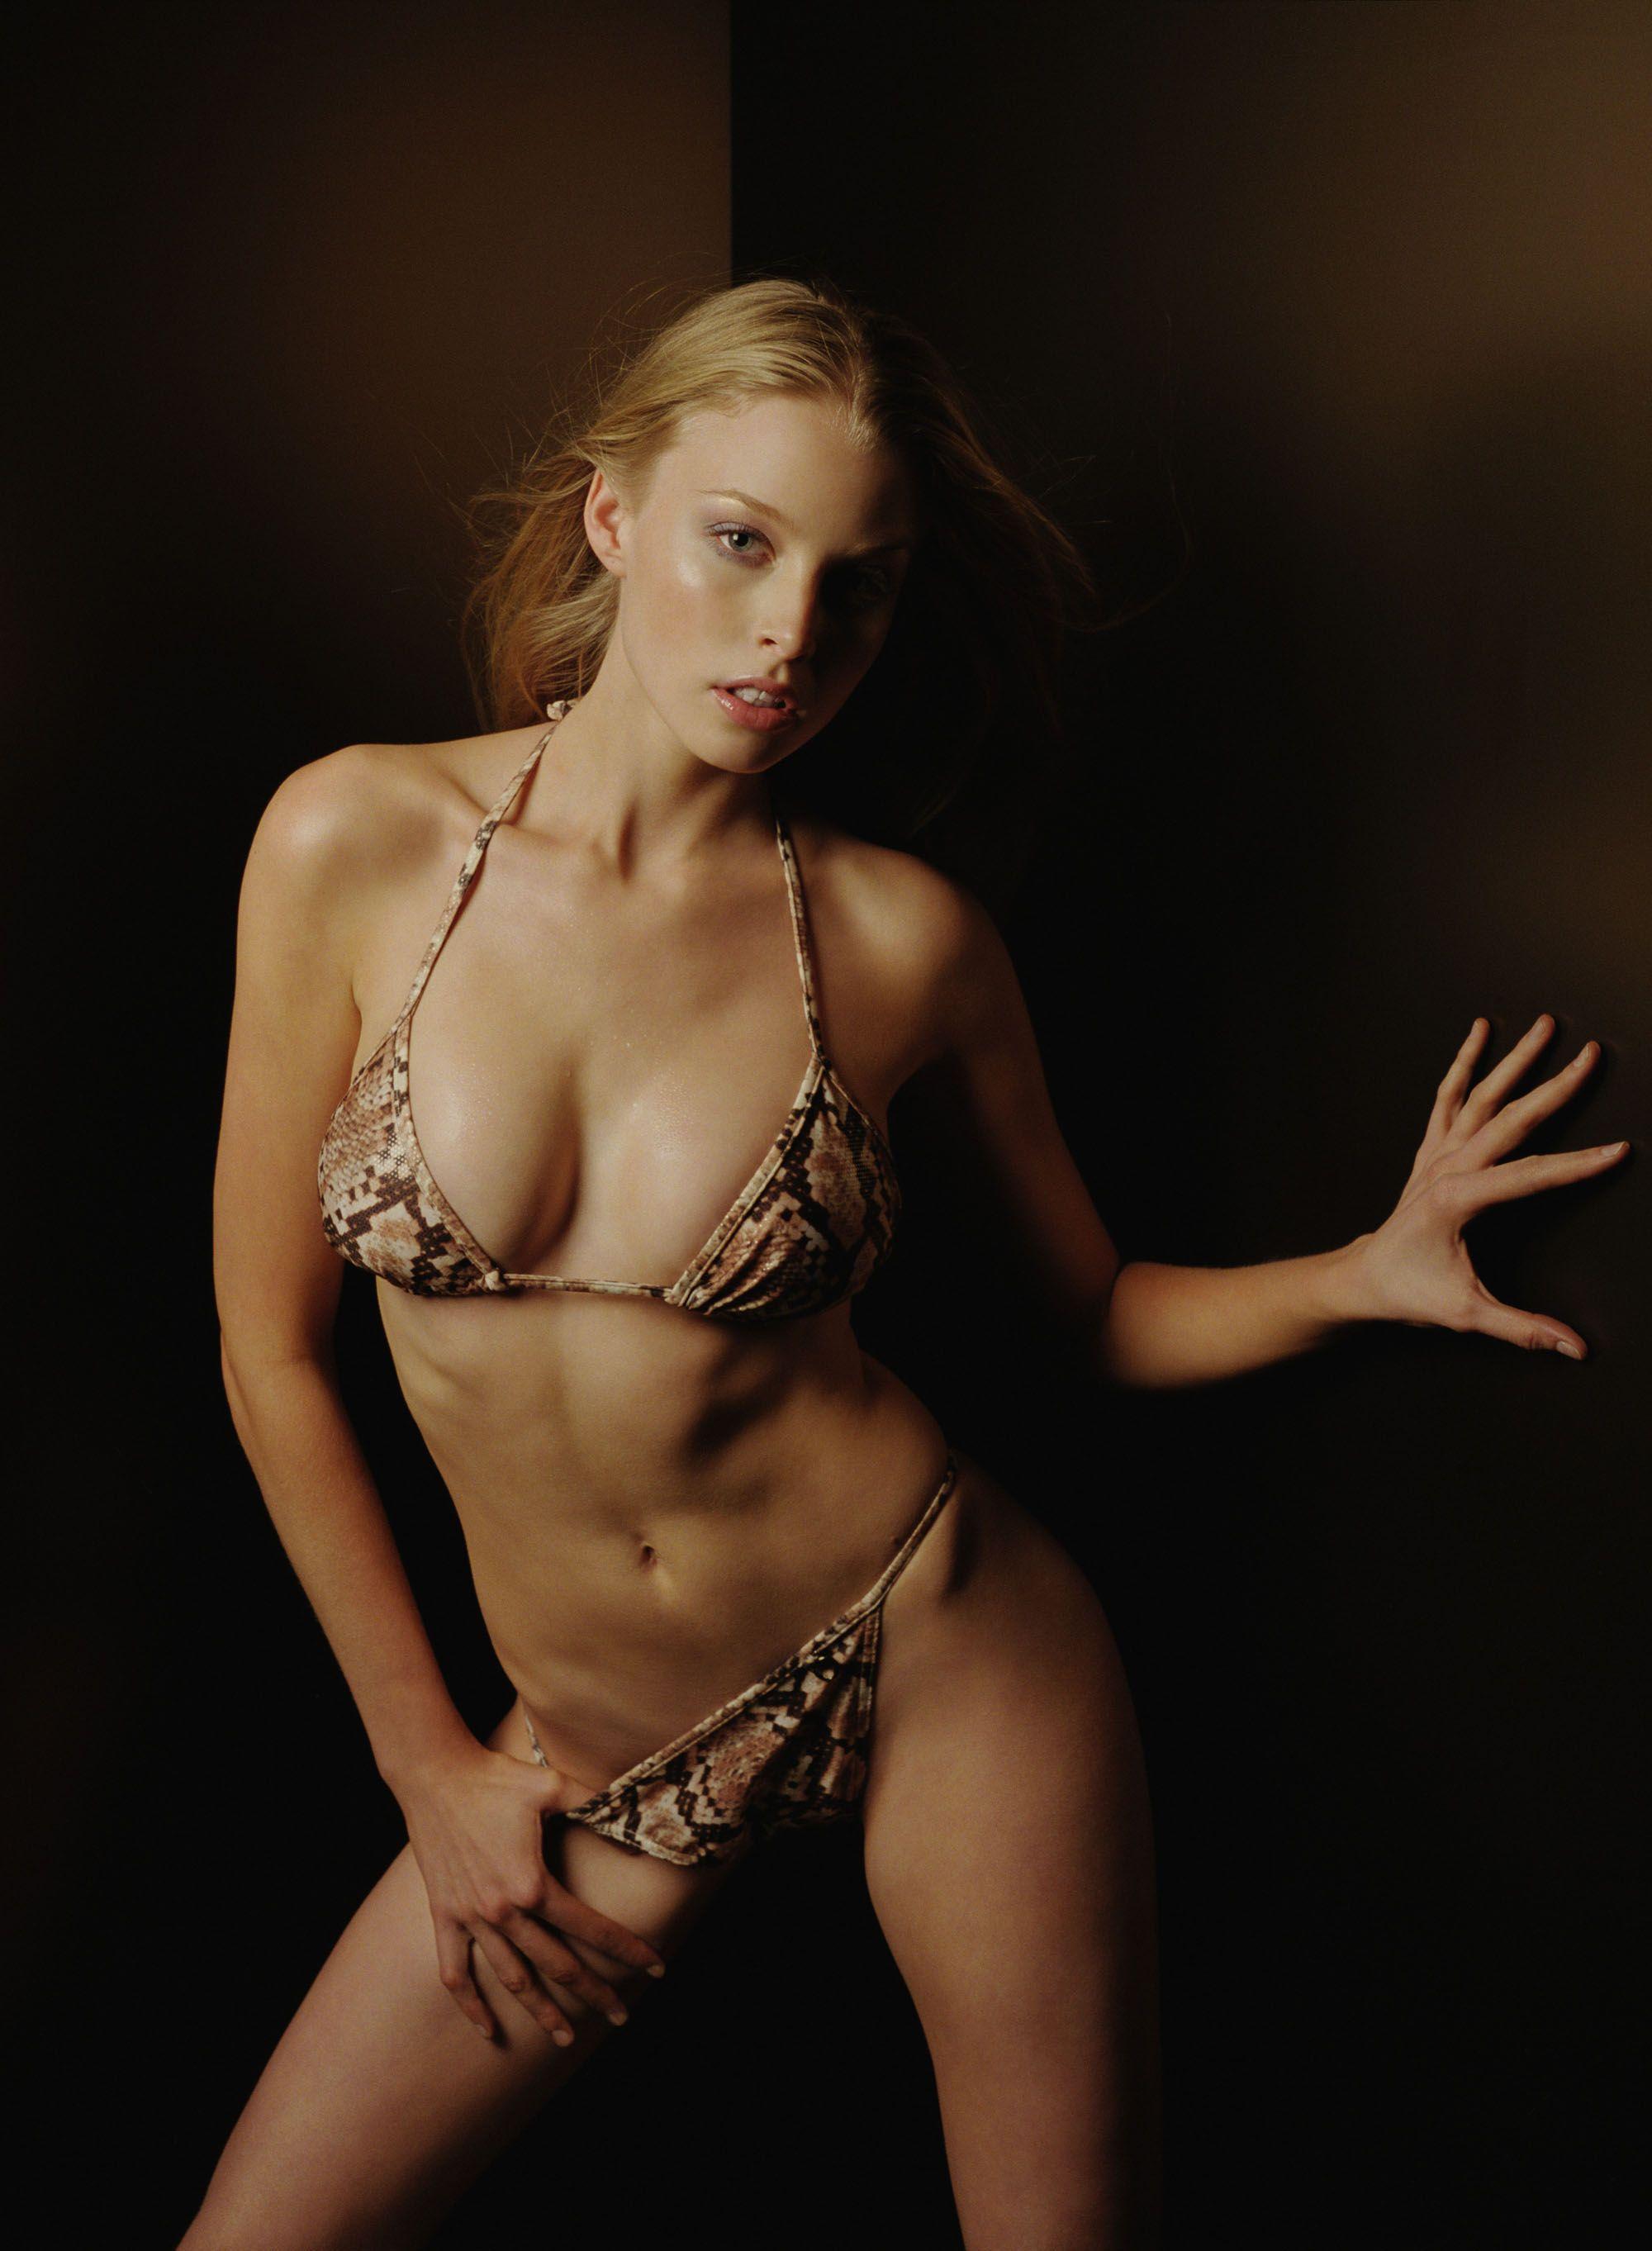 Bikini Rachel Nichols nudes (55 photos), Sexy, Leaked, Feet, braless 2020